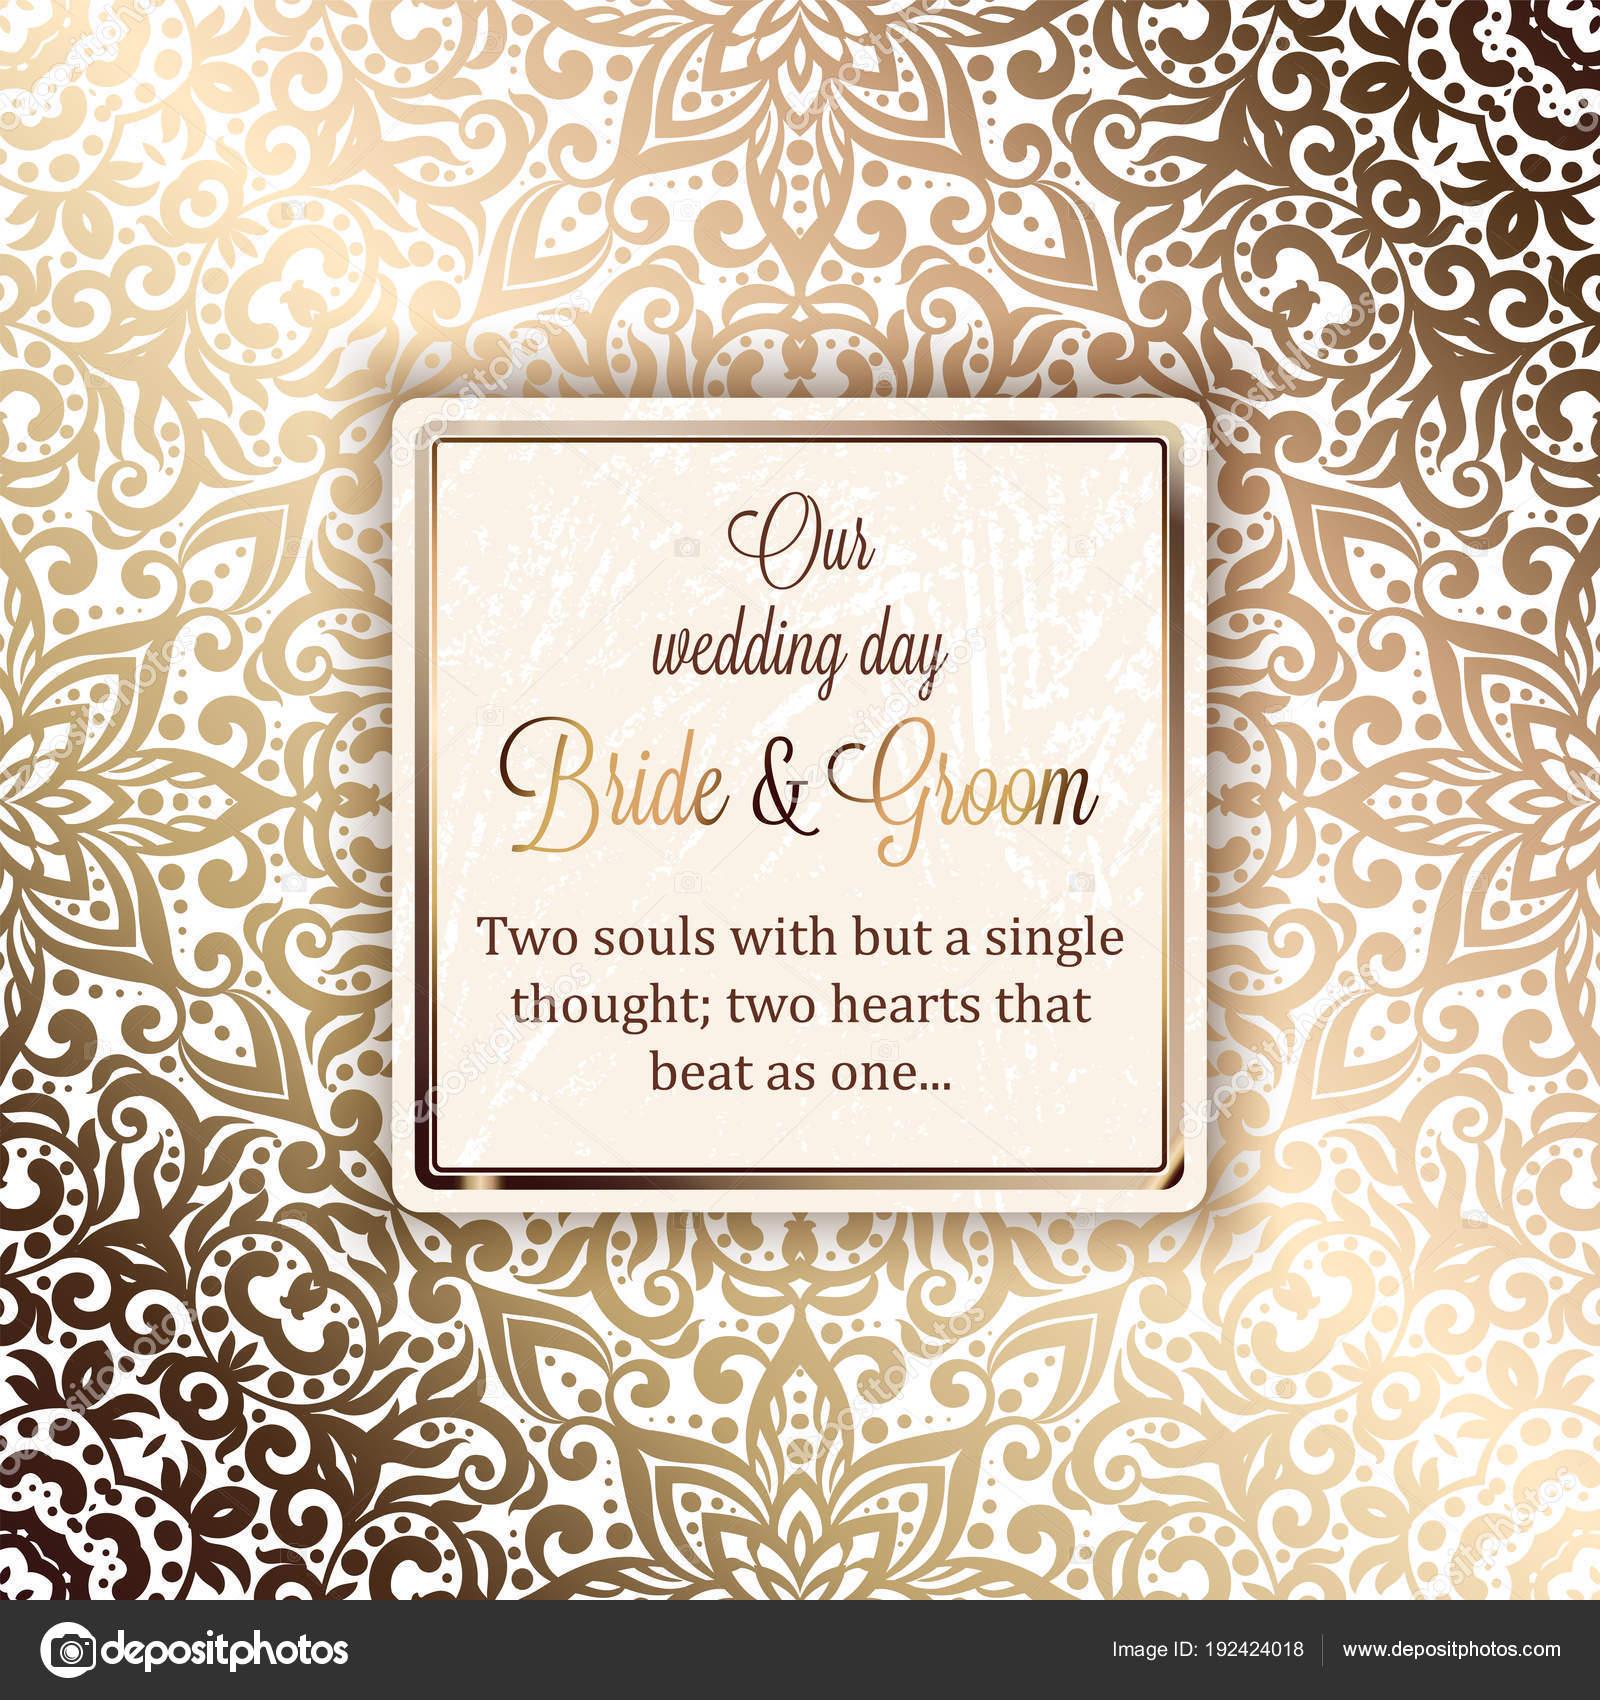 https fr depositphotos com 192424018 stock illustration gold wedding invitation card template html